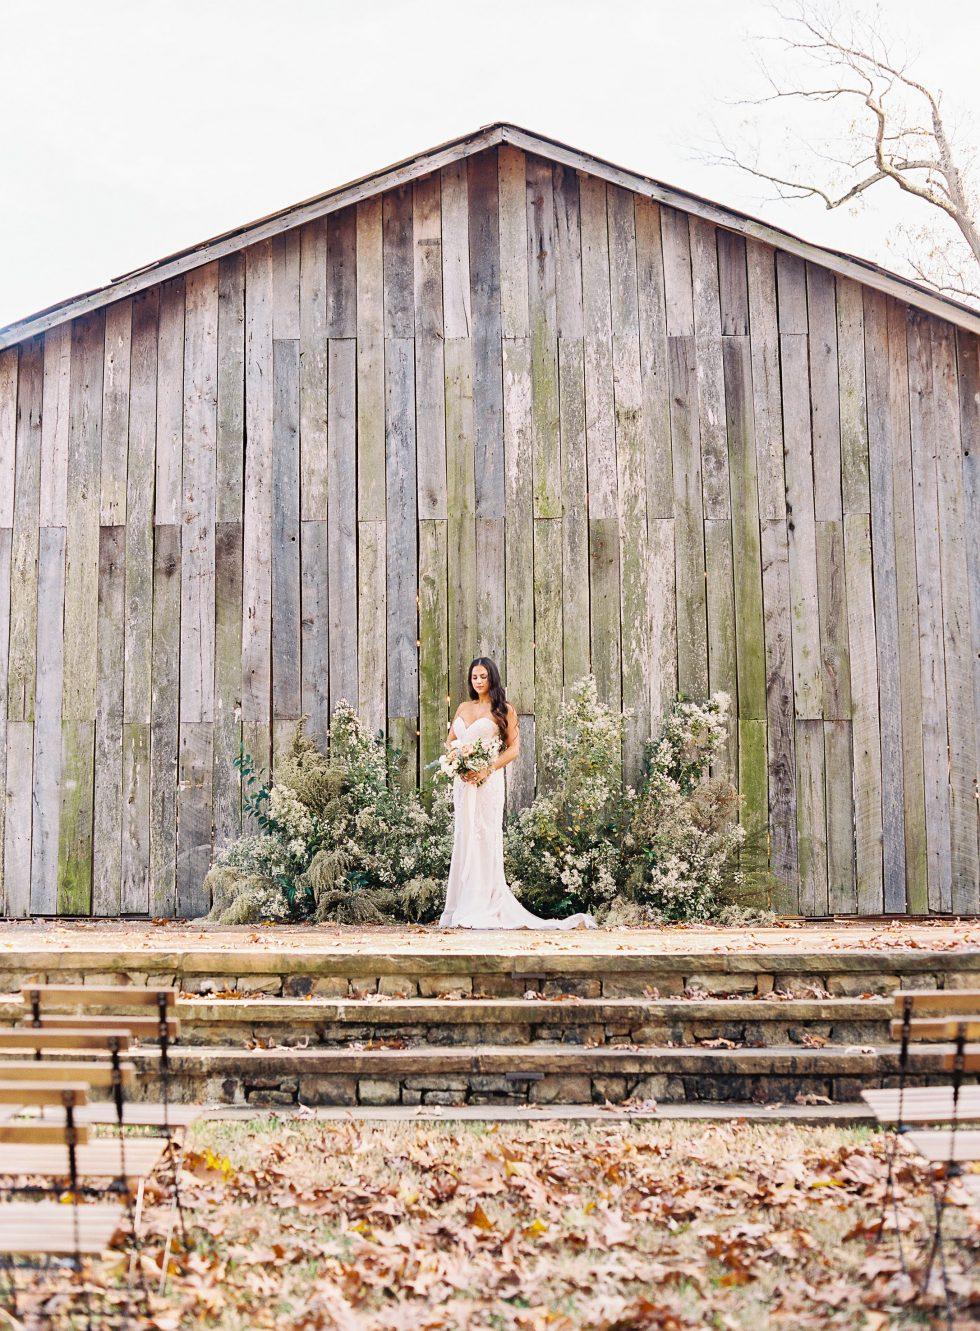 Summerfield-Farms-Outdoor-Fall-Wedding030